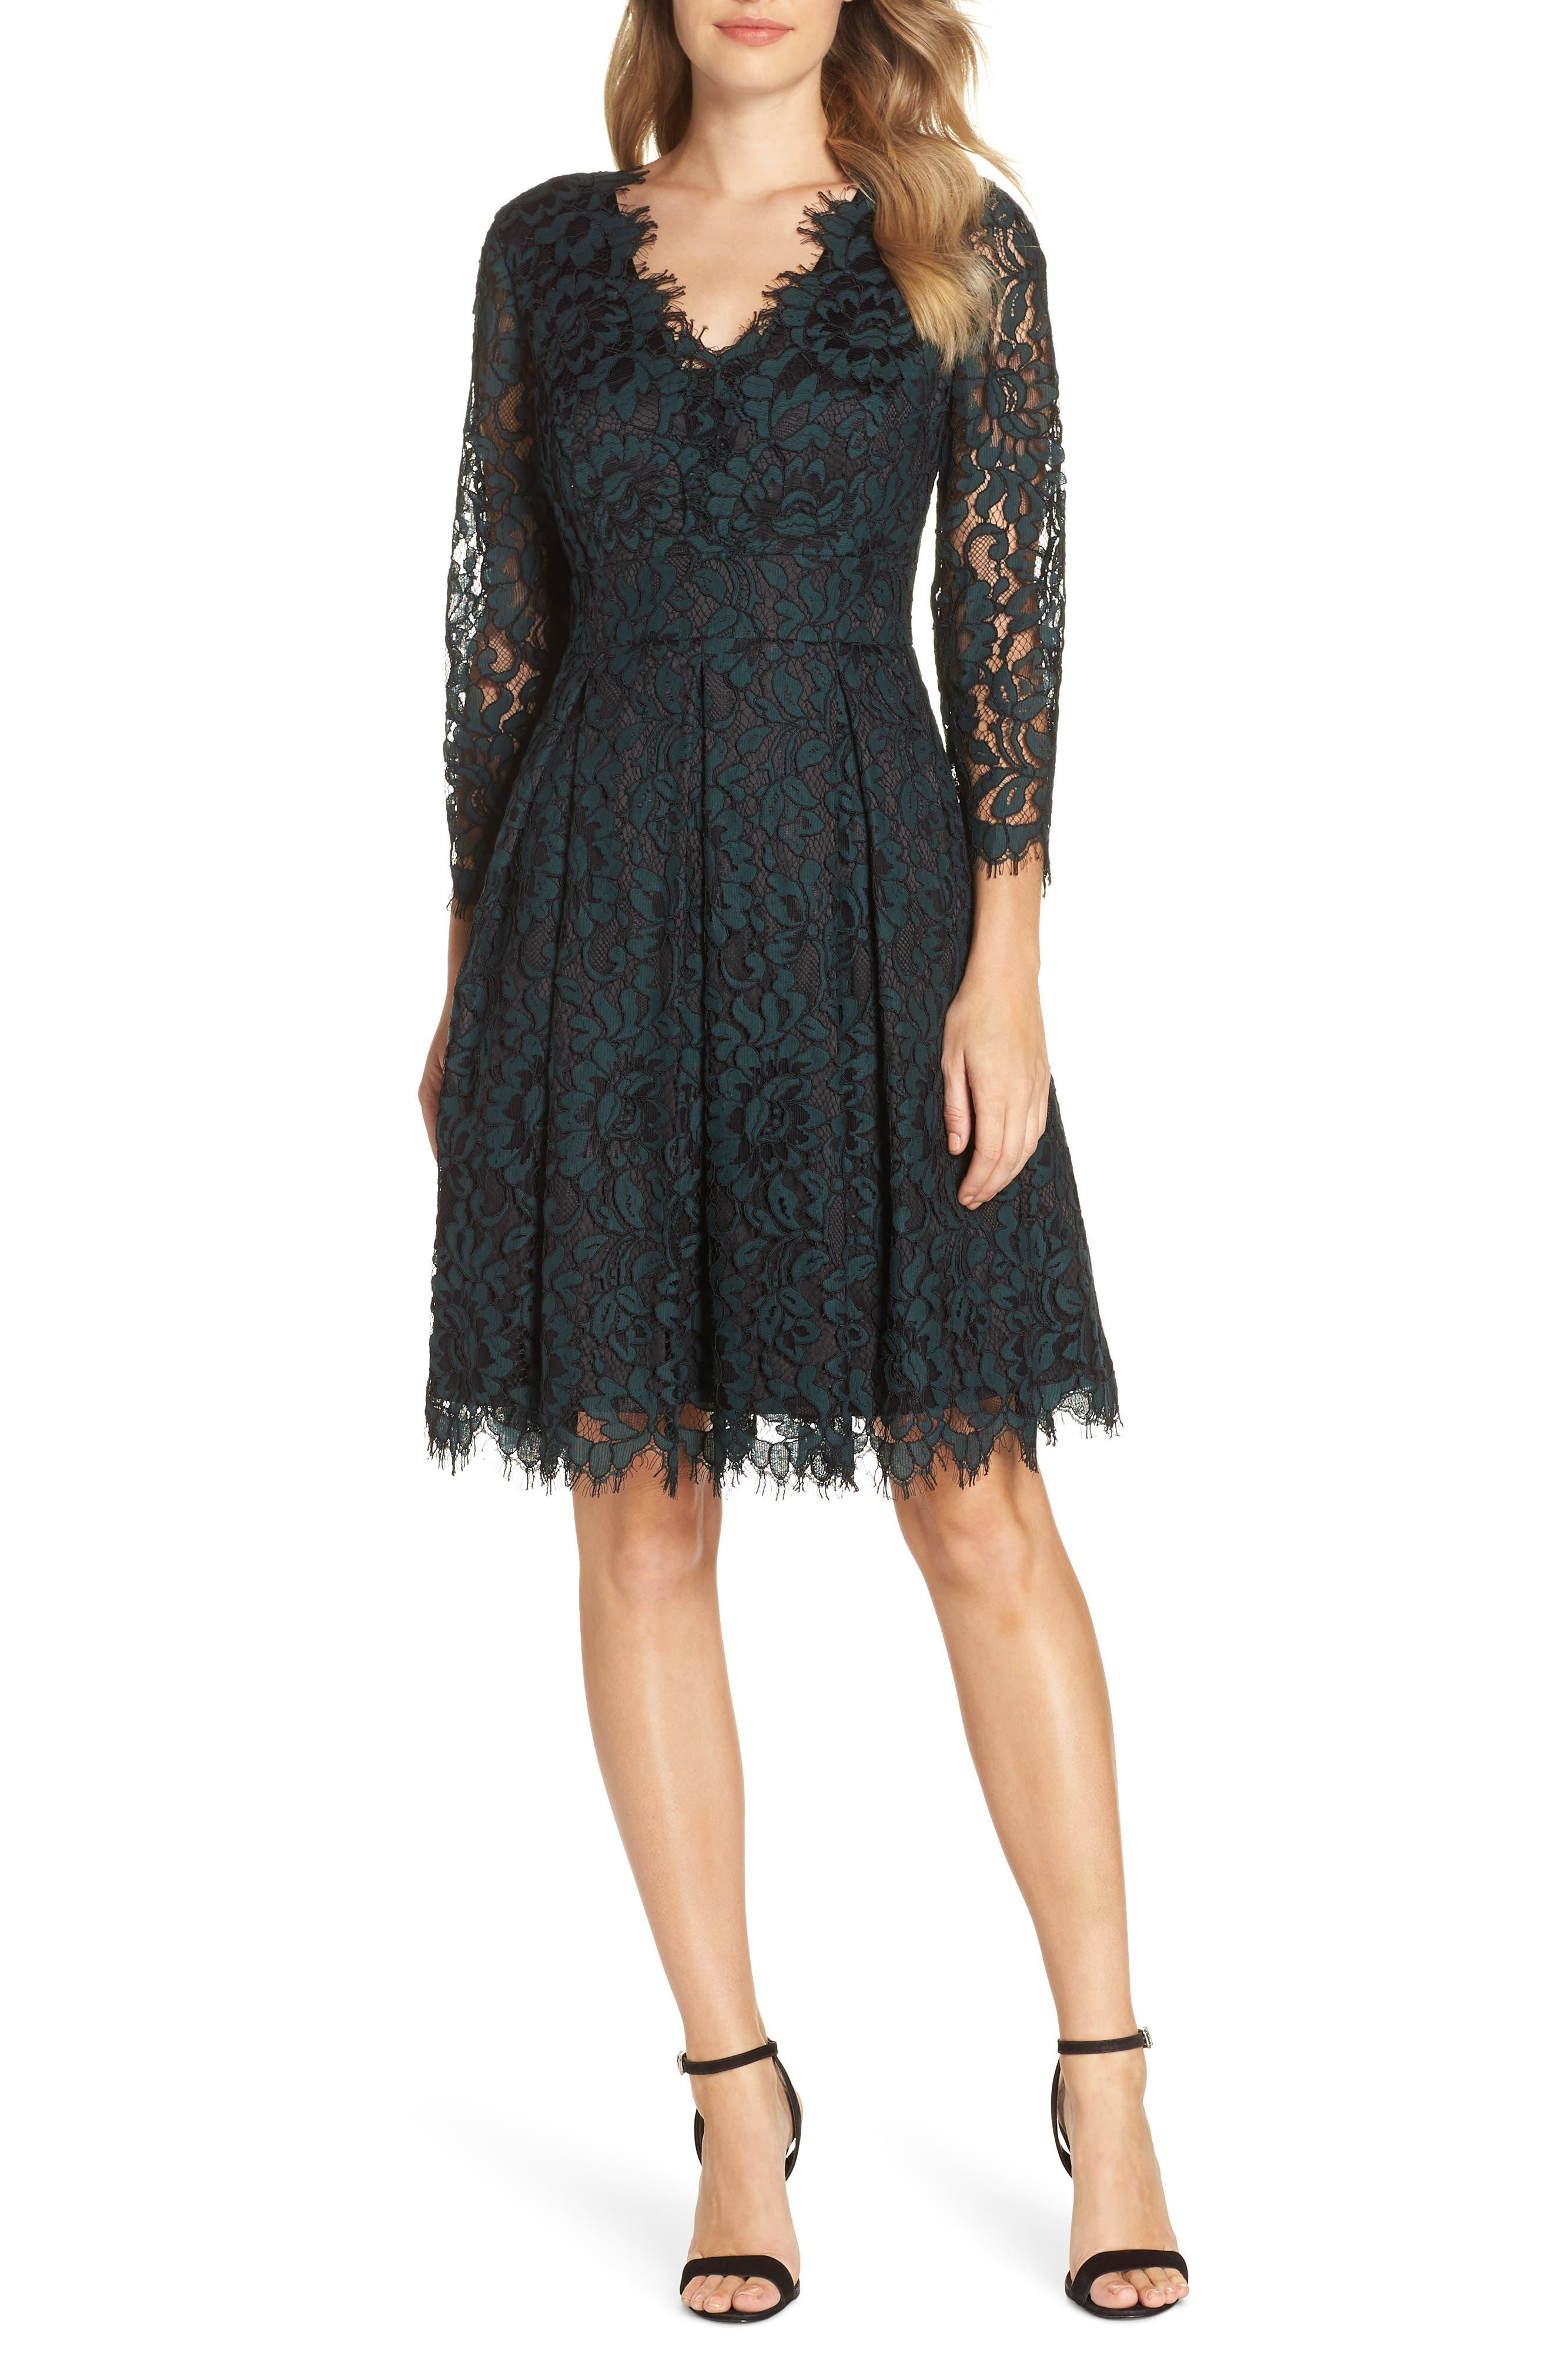 ELIZA J Lace V-Neck Fit & Flare Dress, Main, color, 310